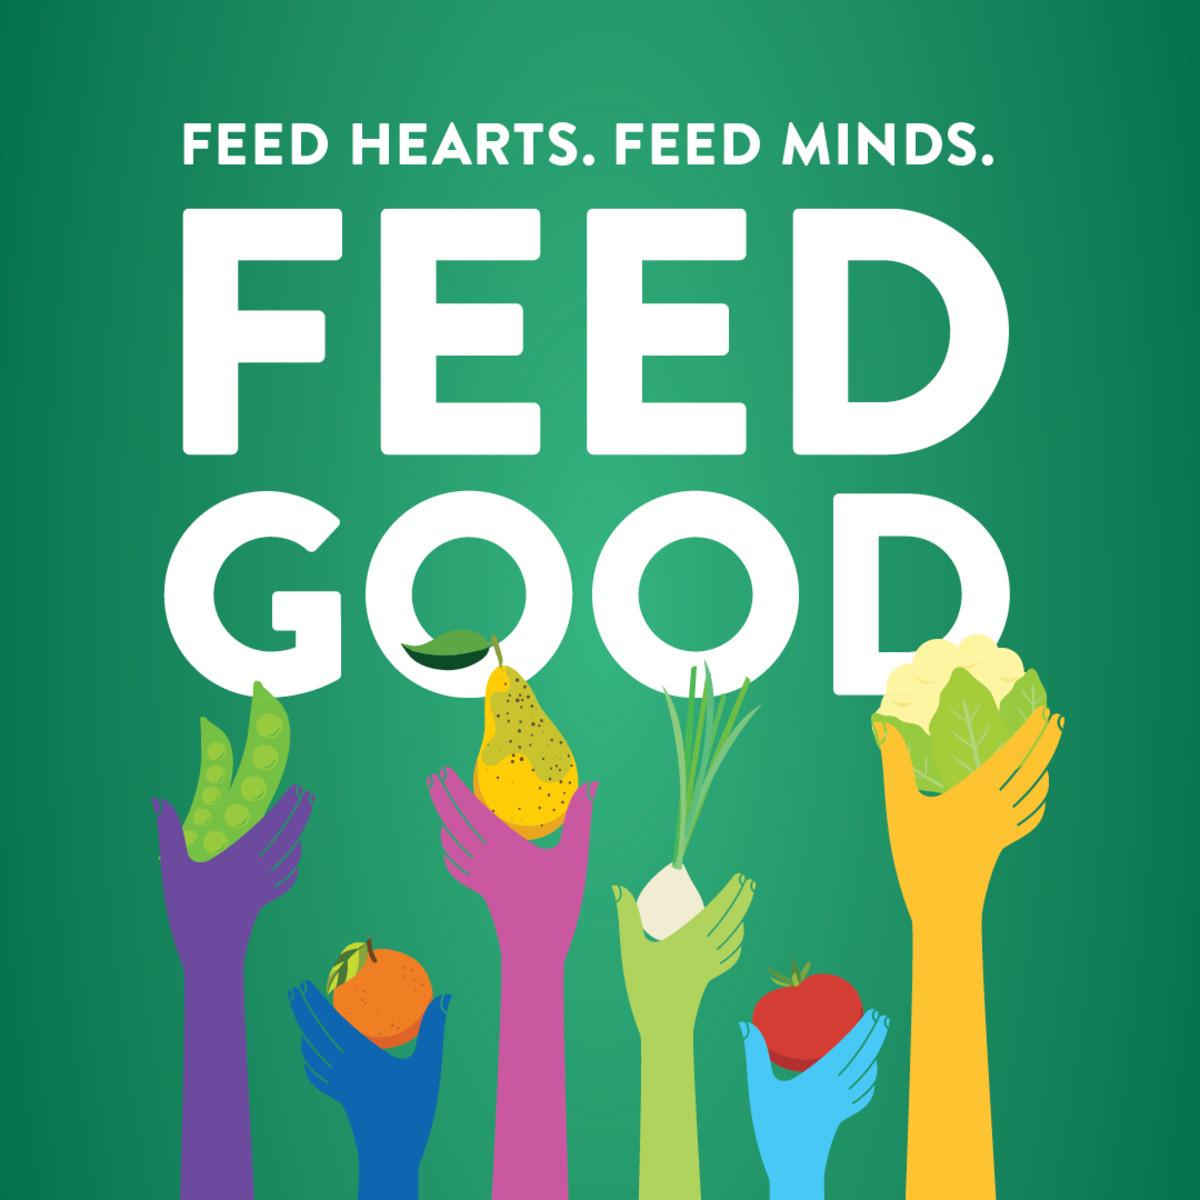 CH20 instagram Facebook Green Hearts Minds 1080x1080